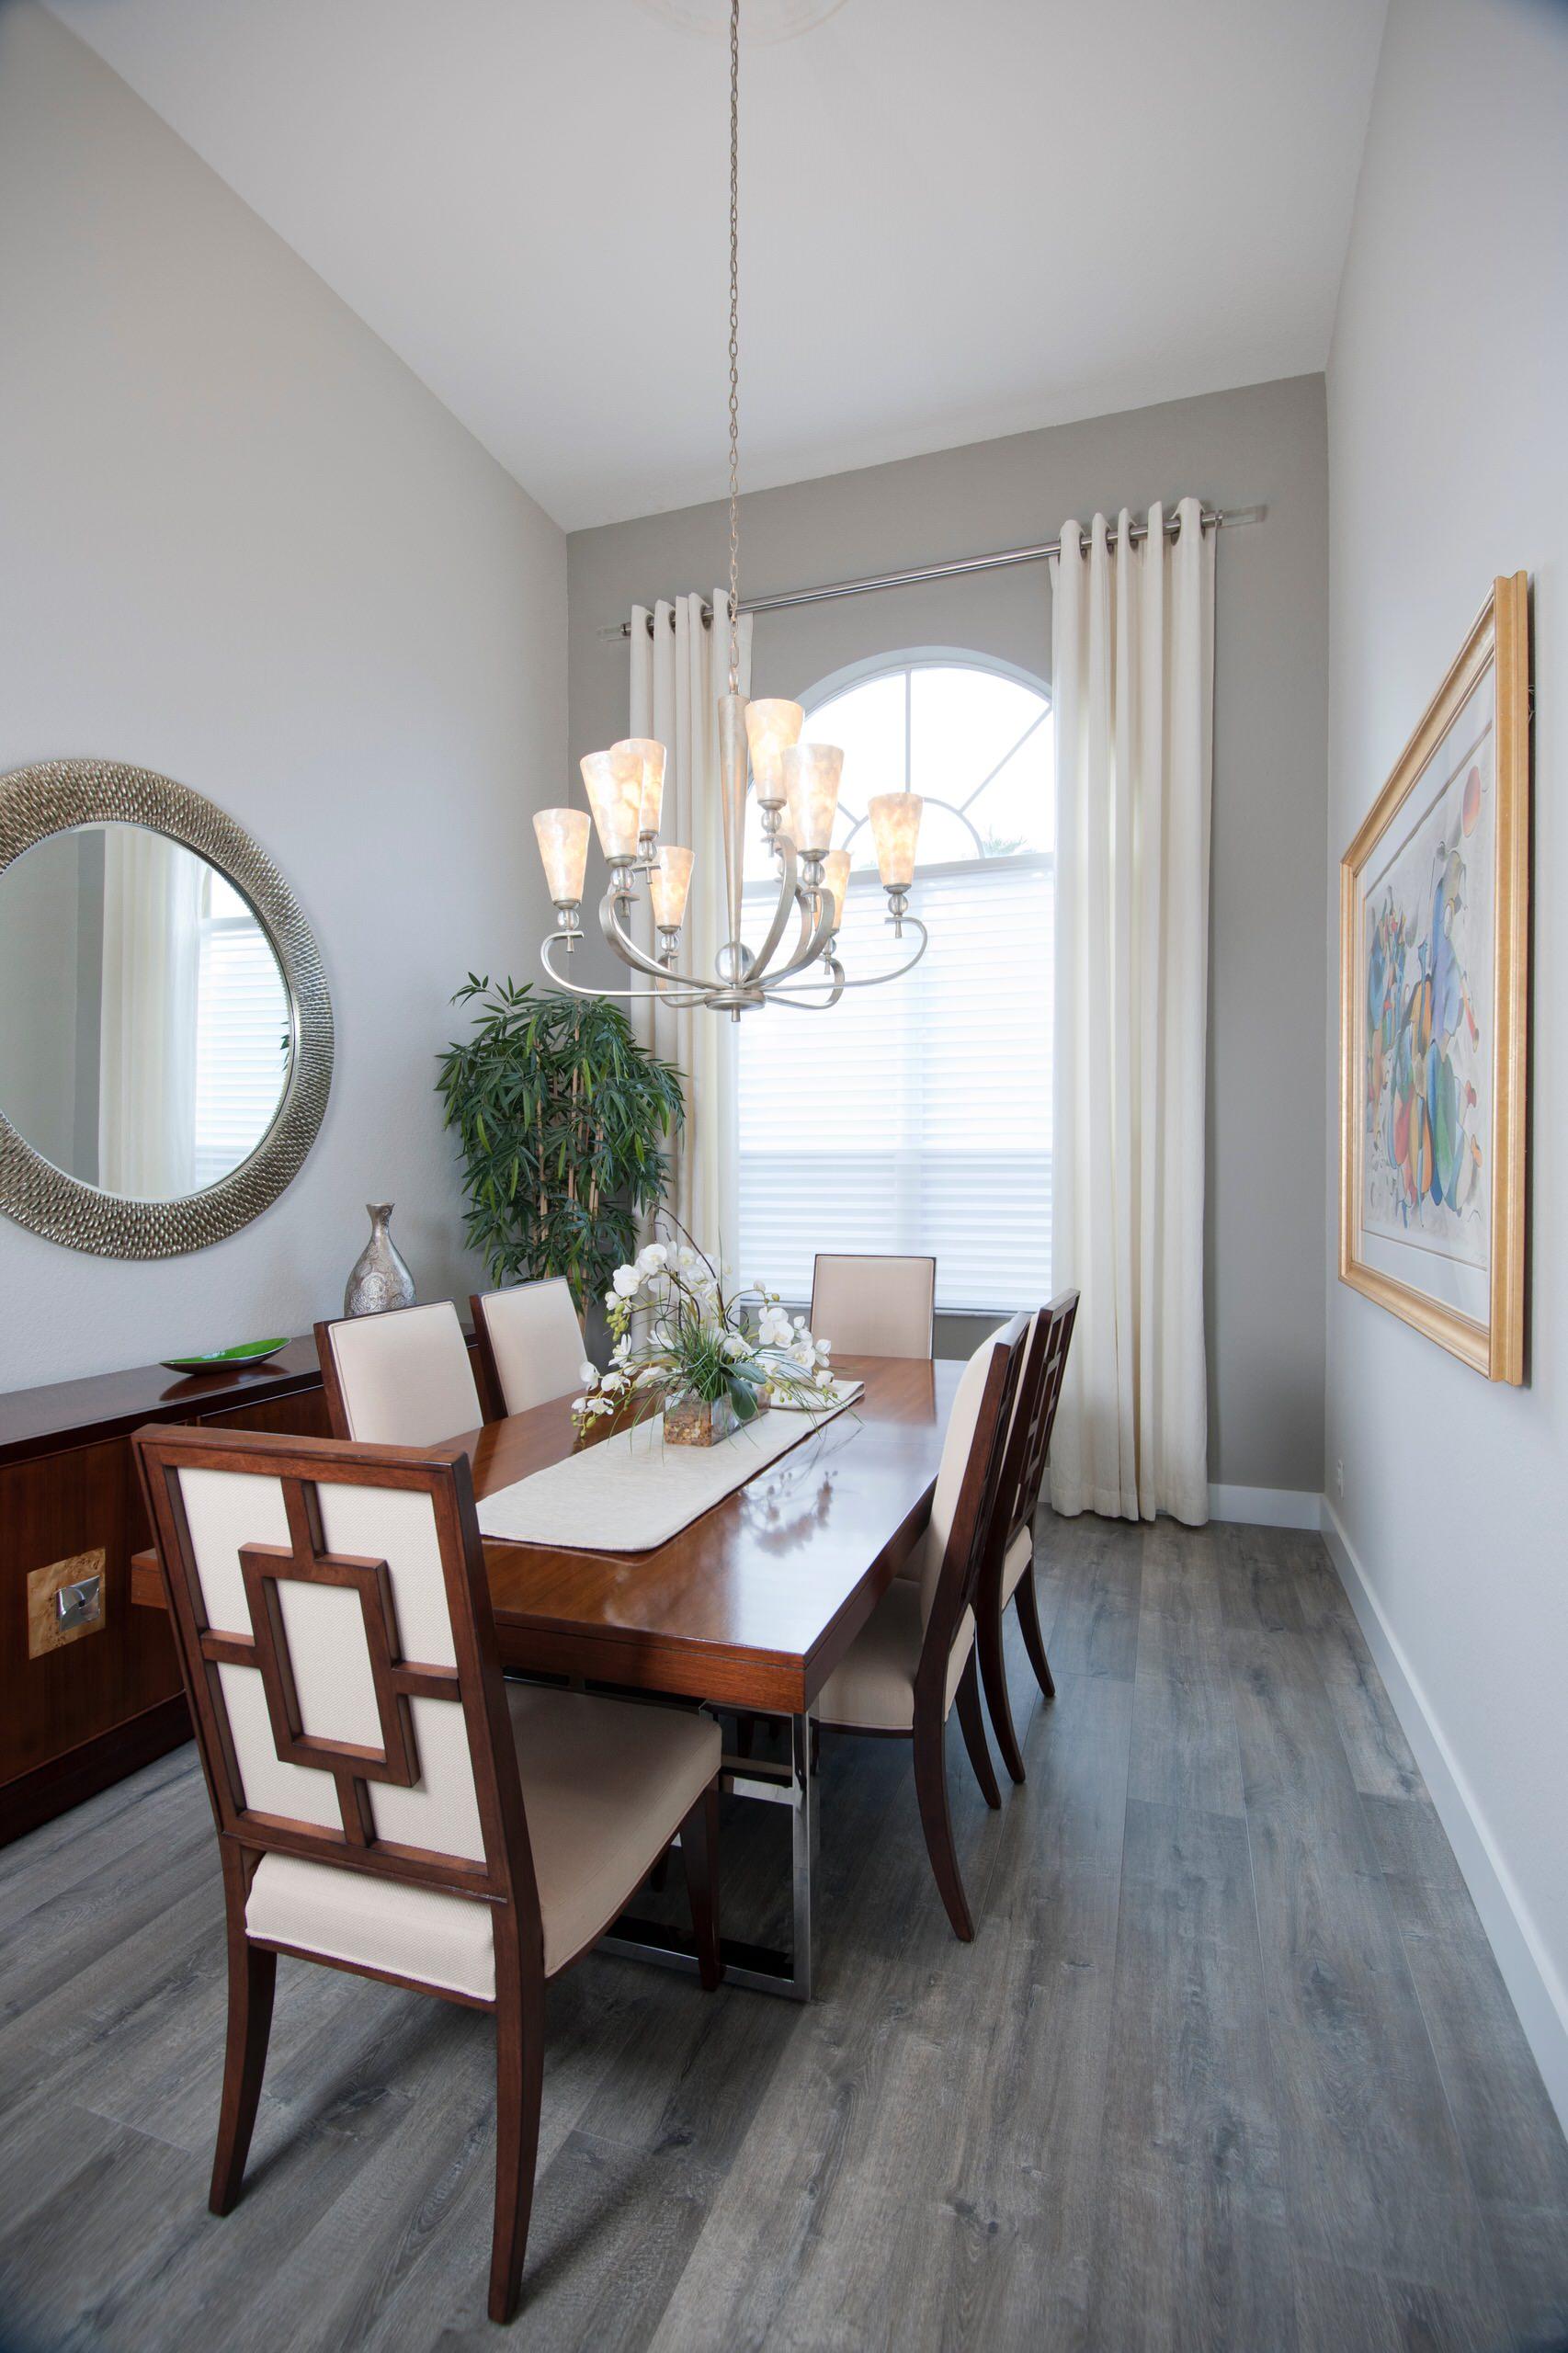 Renovation Magic - Dining Room